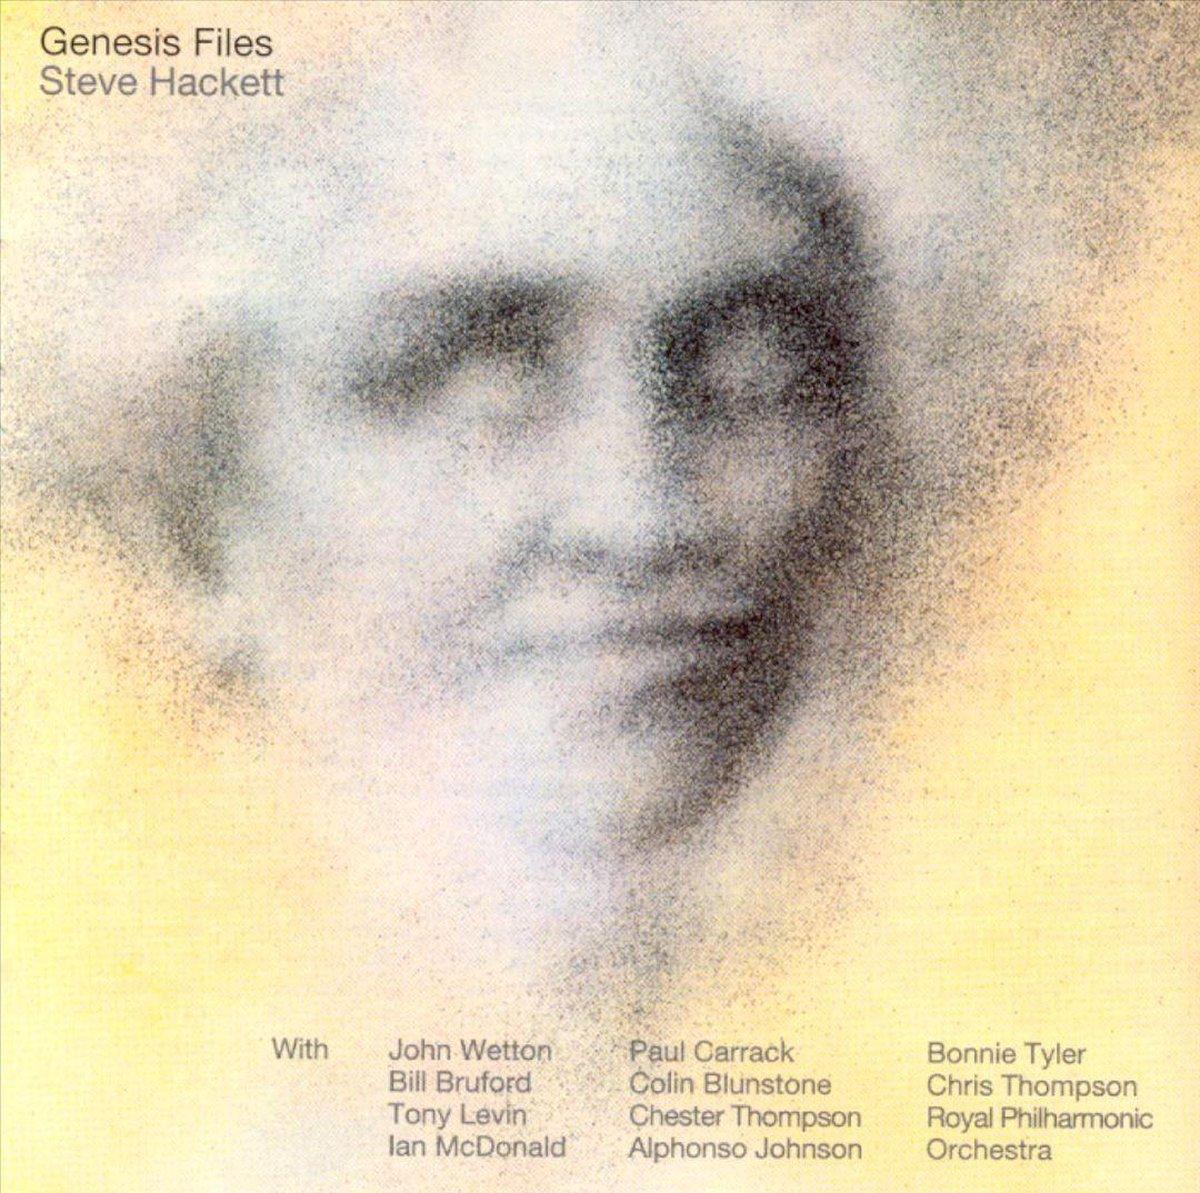 Genesis Files